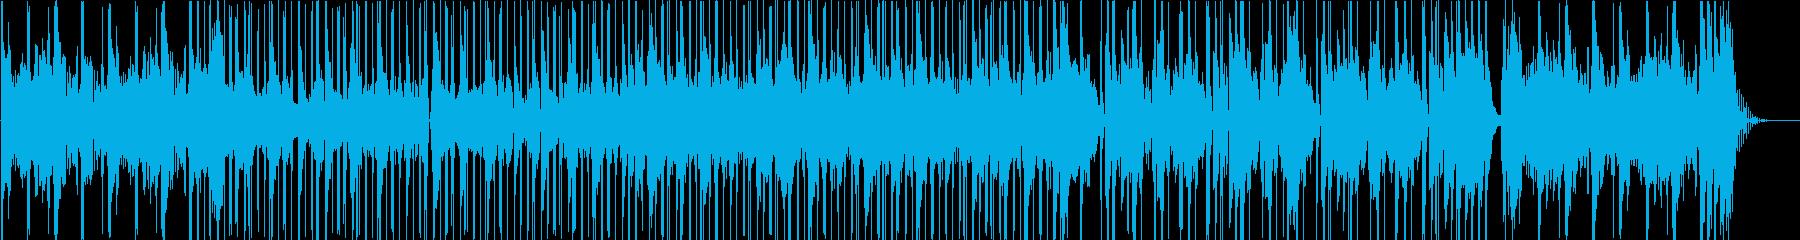 Riverの再生済みの波形